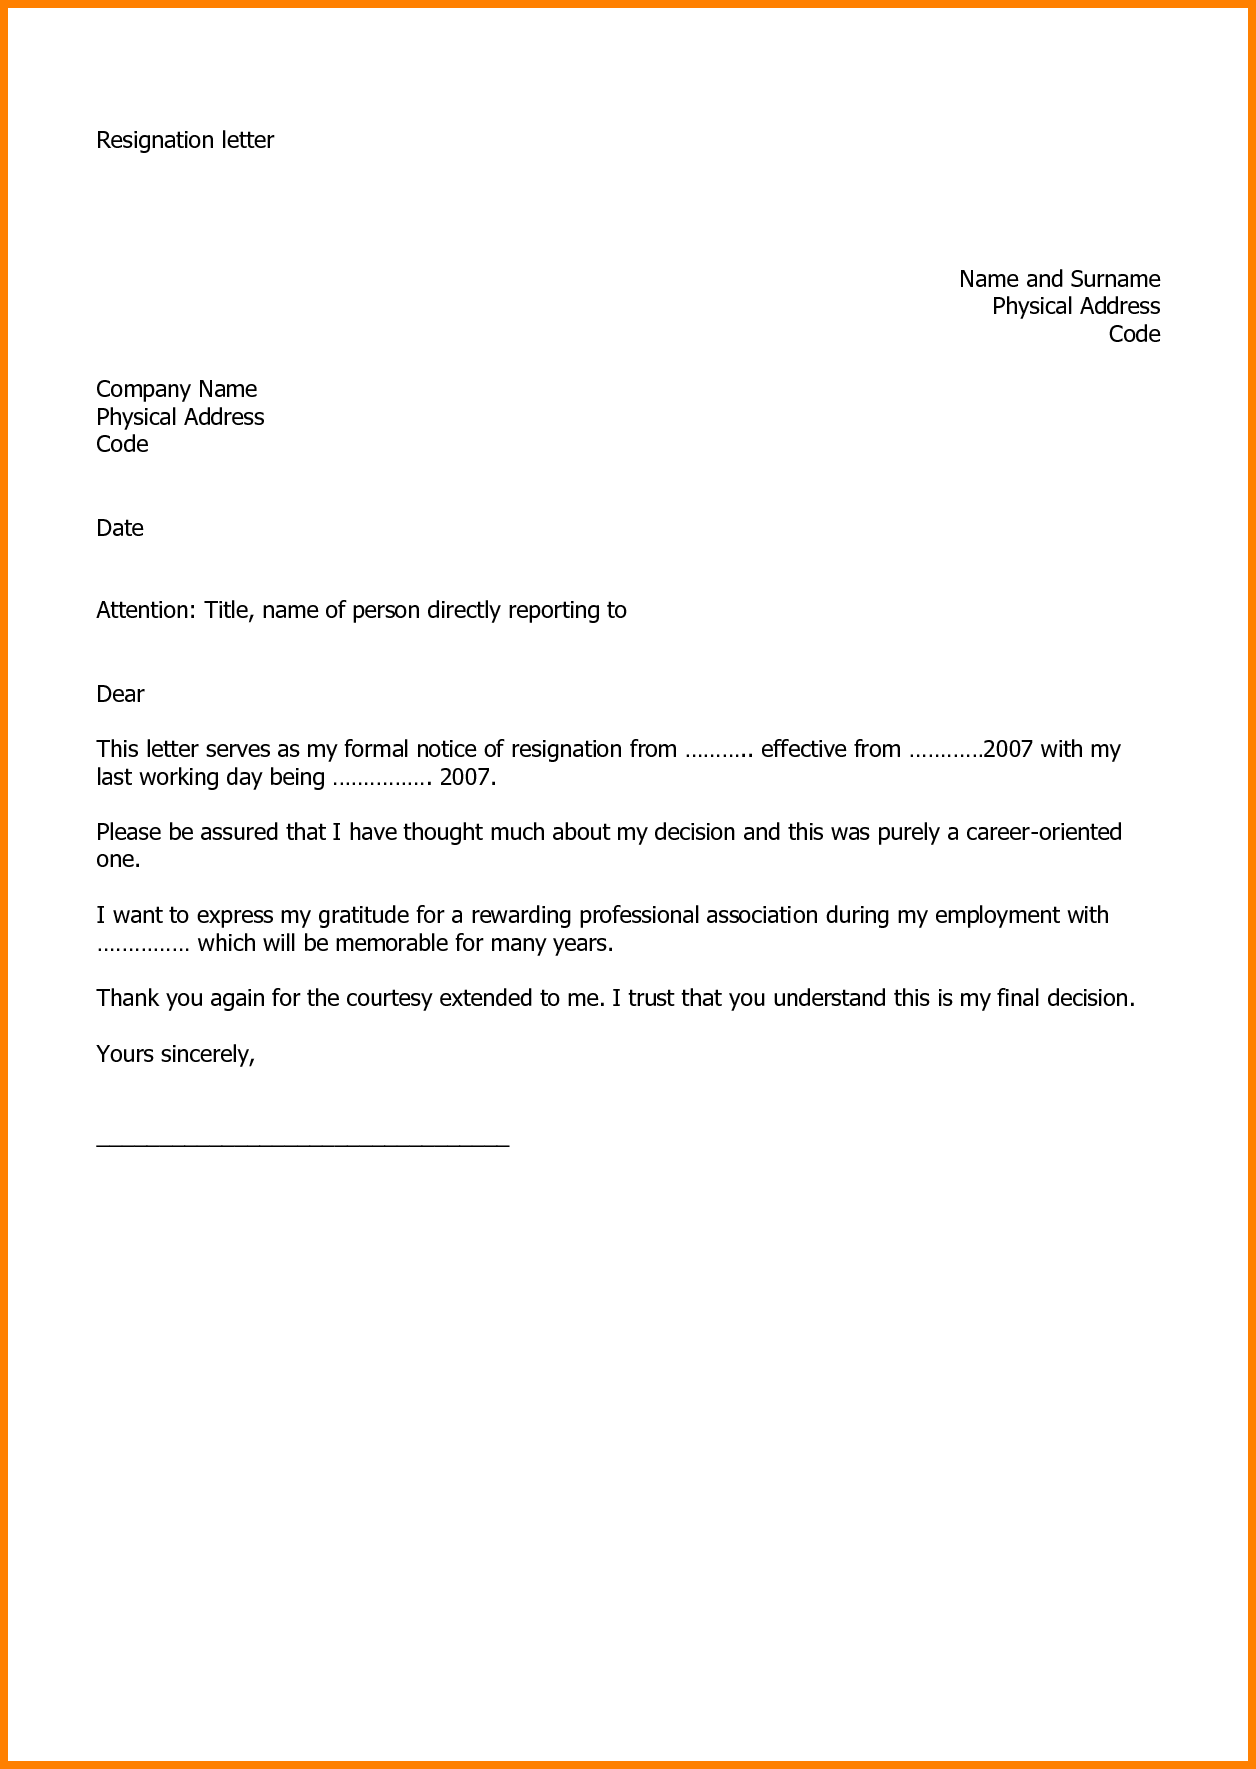 Pin by Mike Marischler on Health  Resignation letter Formal resignation letter sample